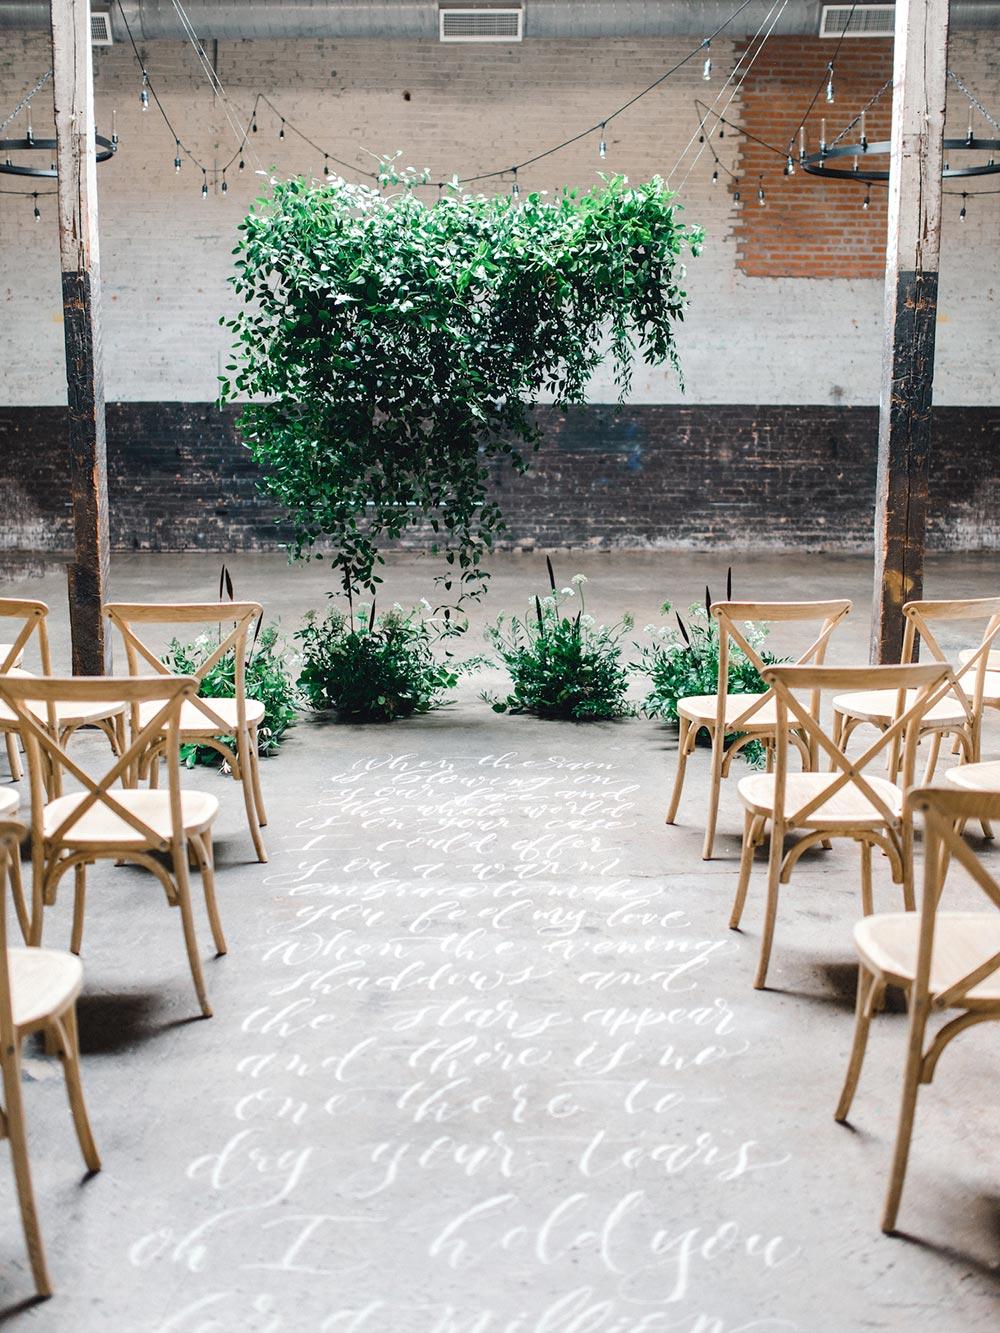 suspended greenery wedding ceremony backdrop